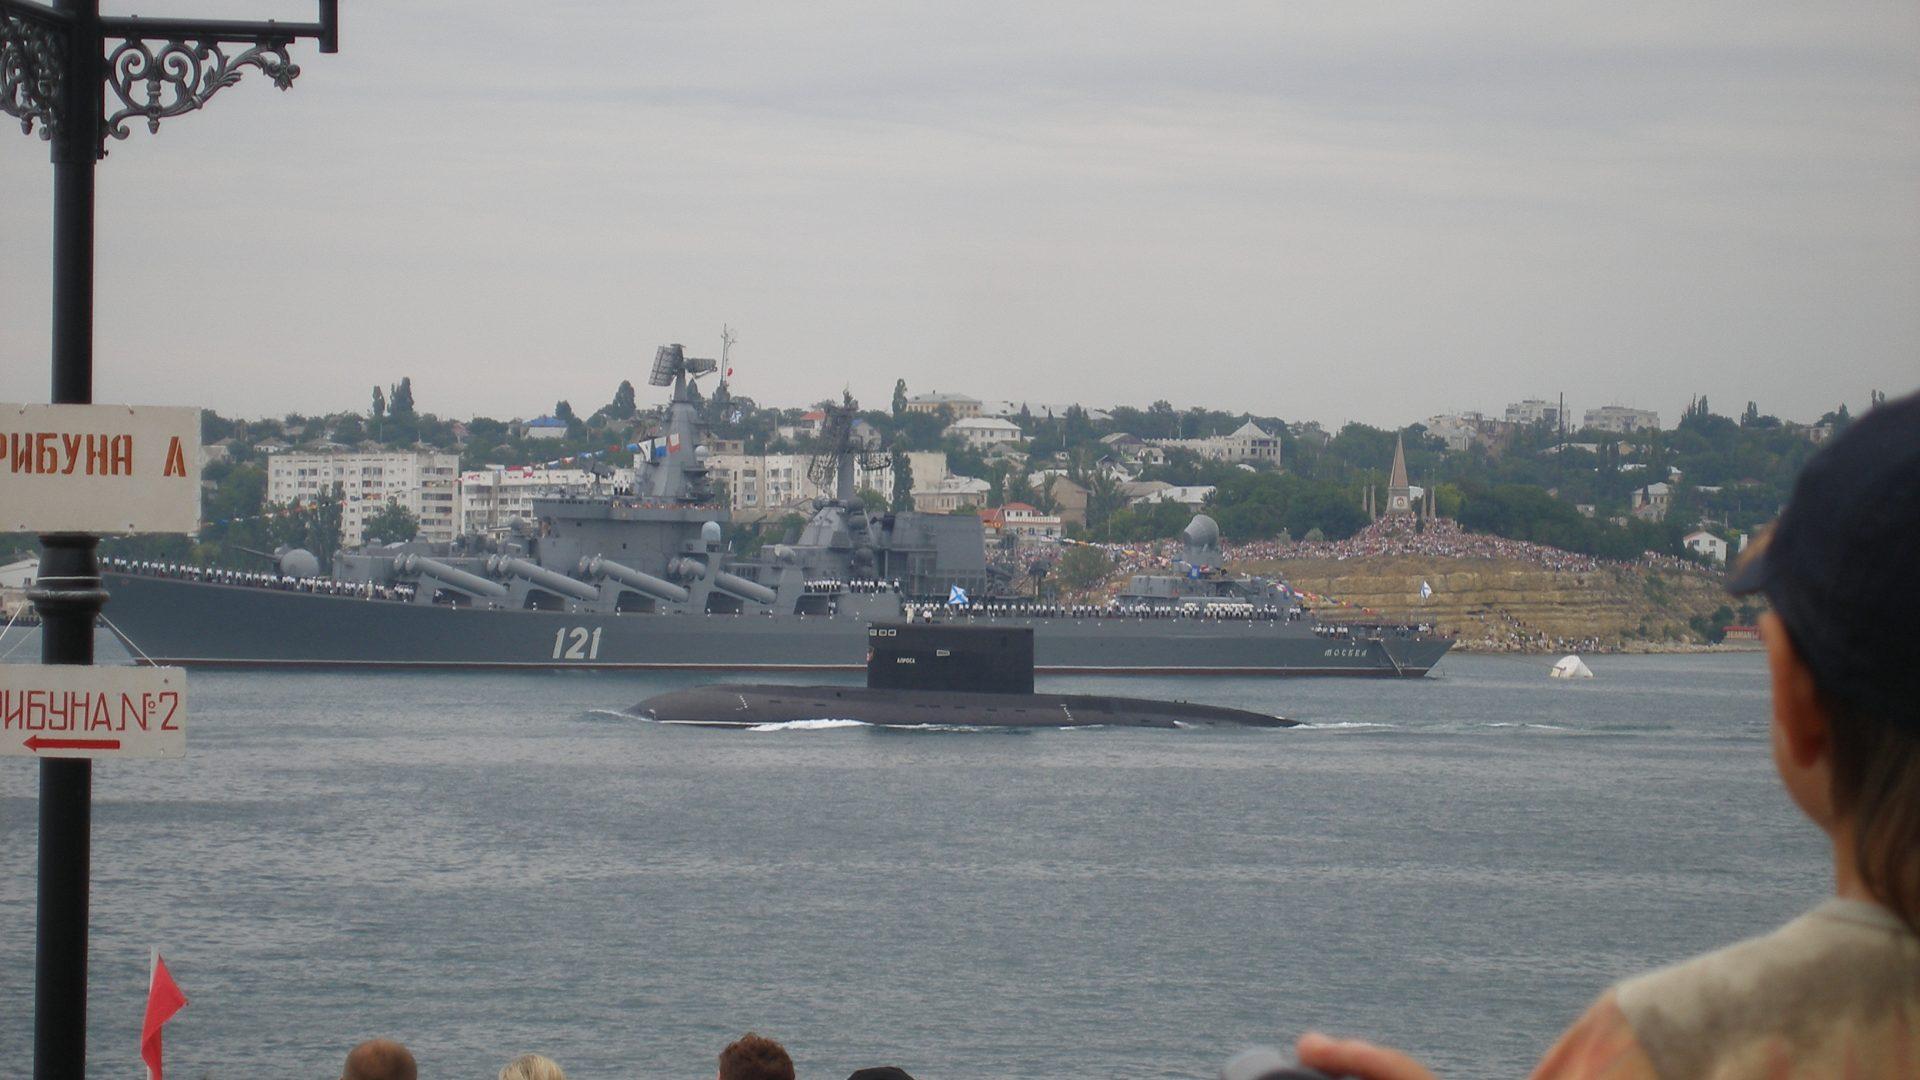 Submarinele României. Proiect 877 Paltus. Delfinul